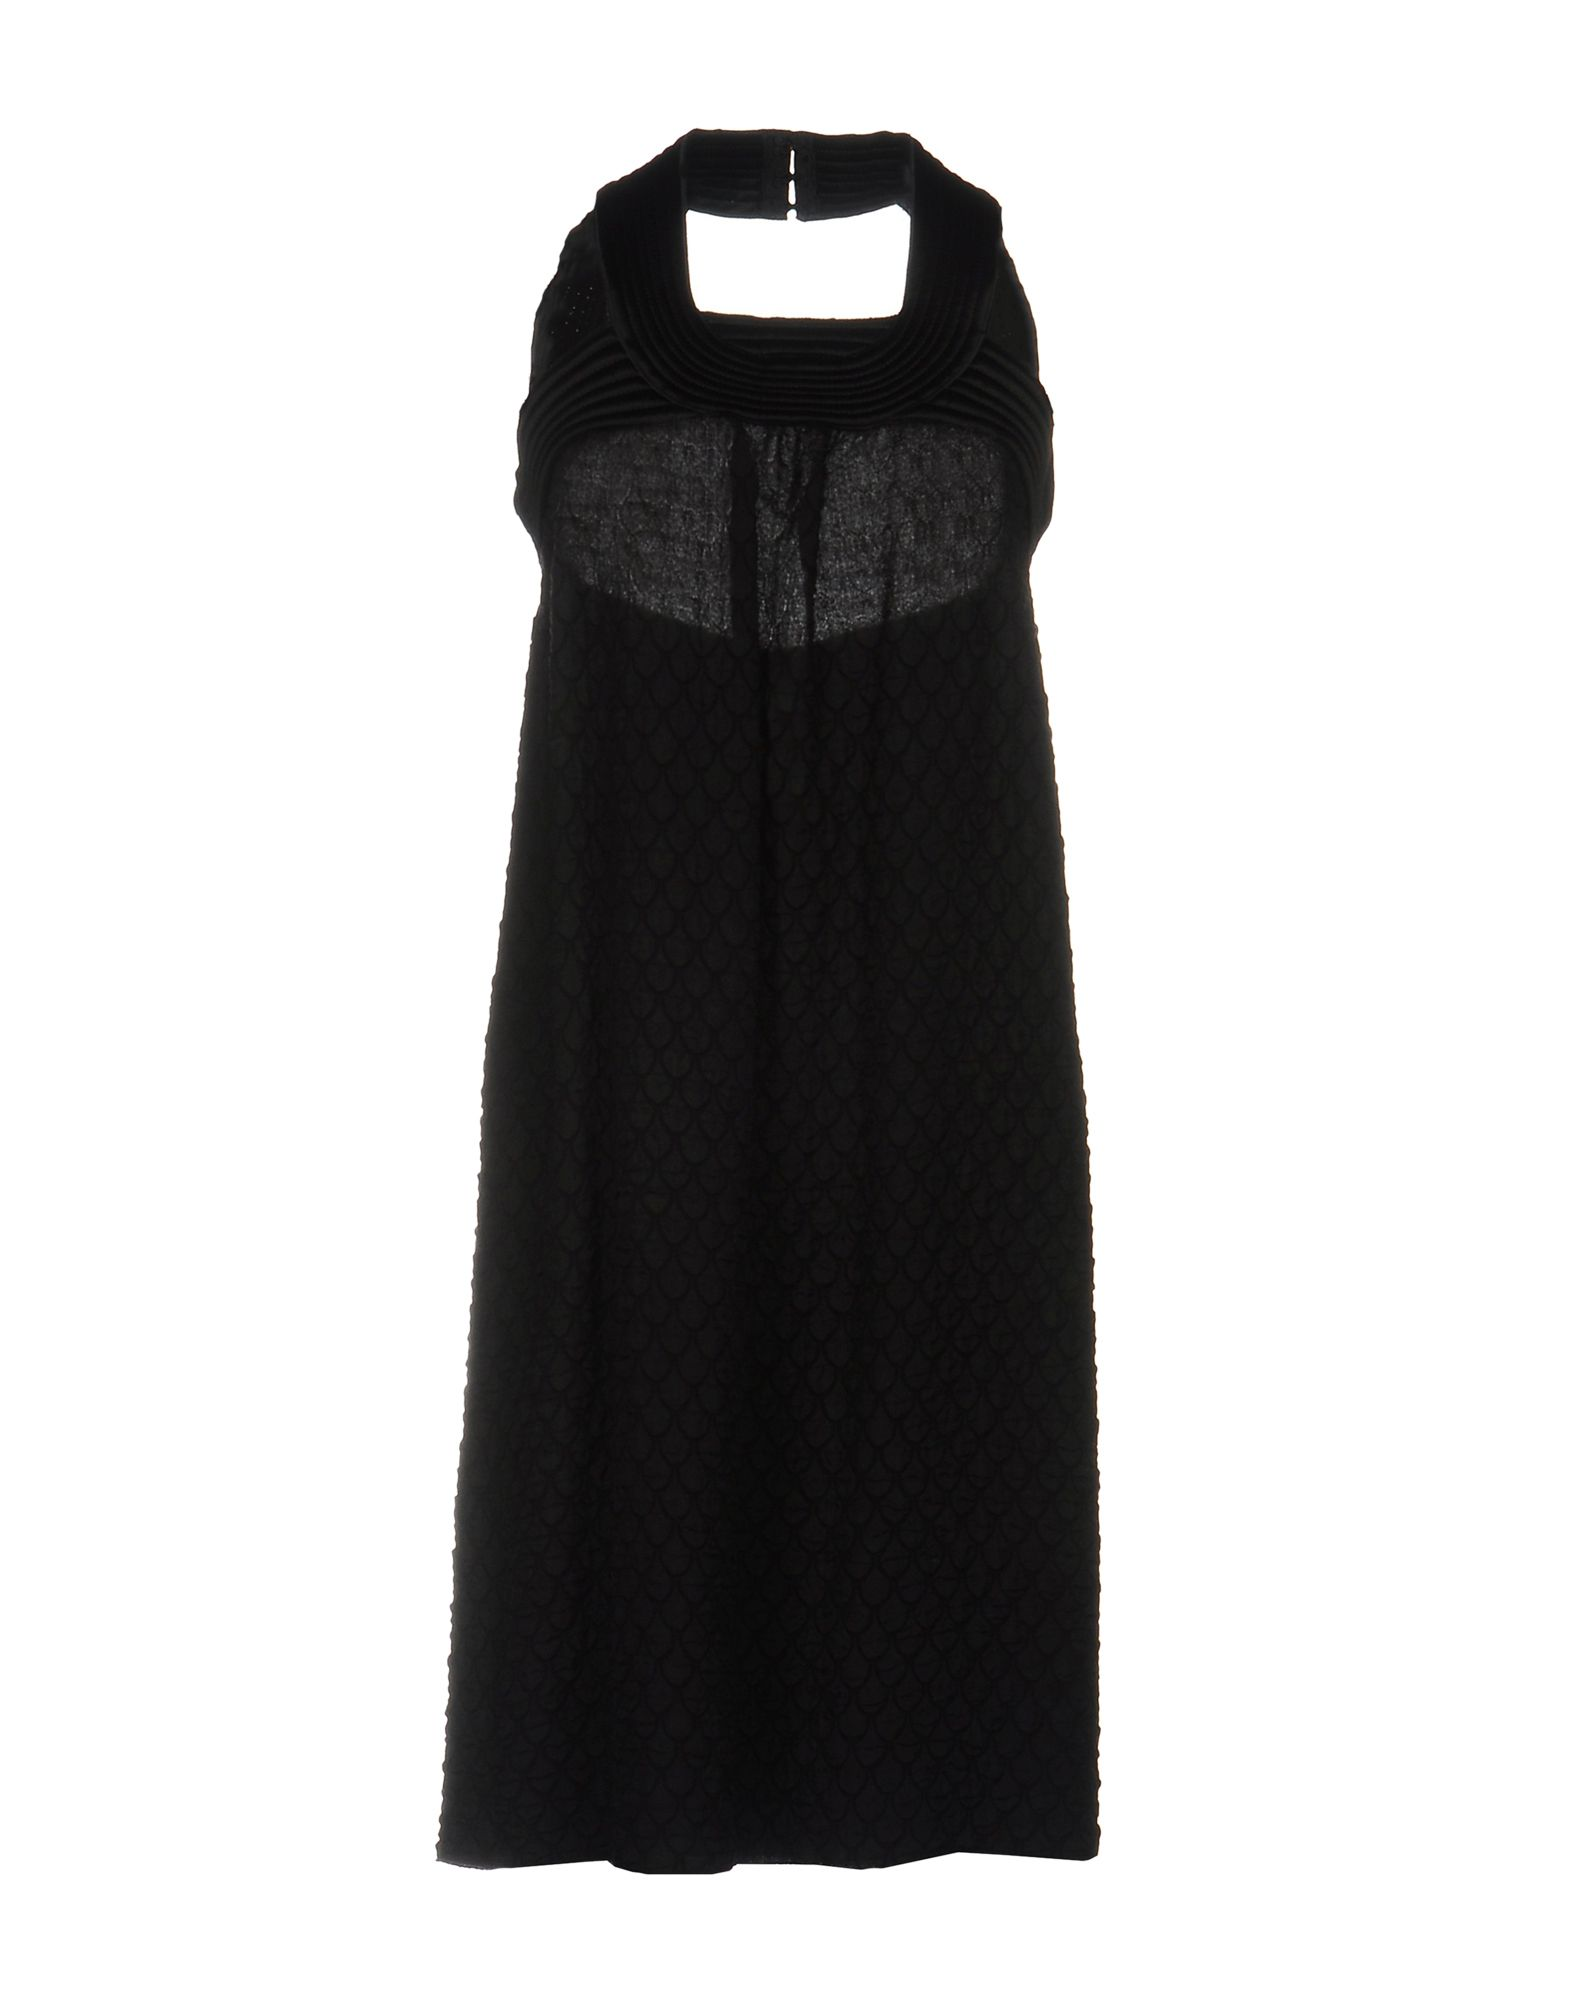 JEAN PAUL GAULTIER FEMME Платье до колена jean paul gaultier платье до колена